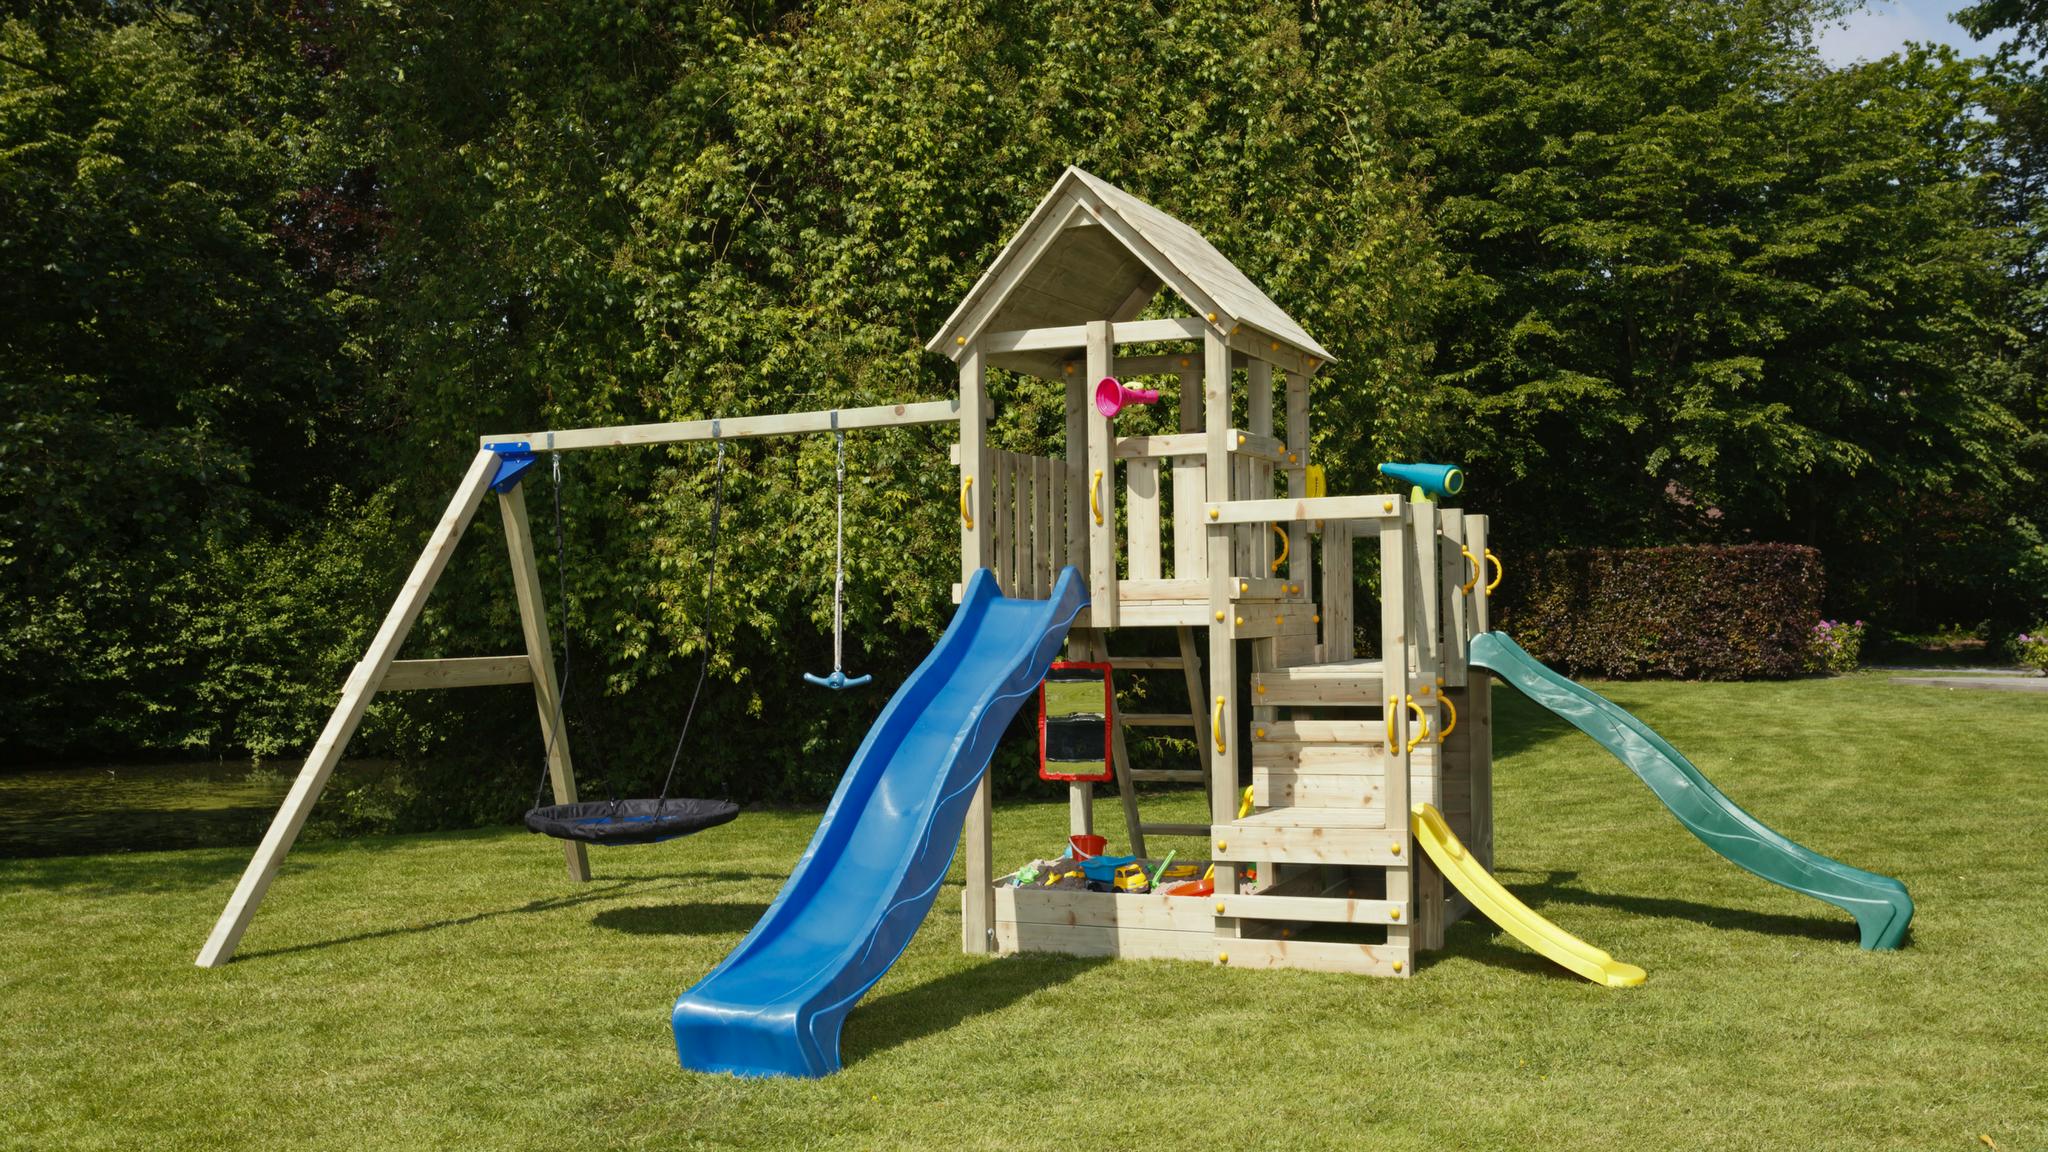 Kodune mänguväljak on lapsele arendav